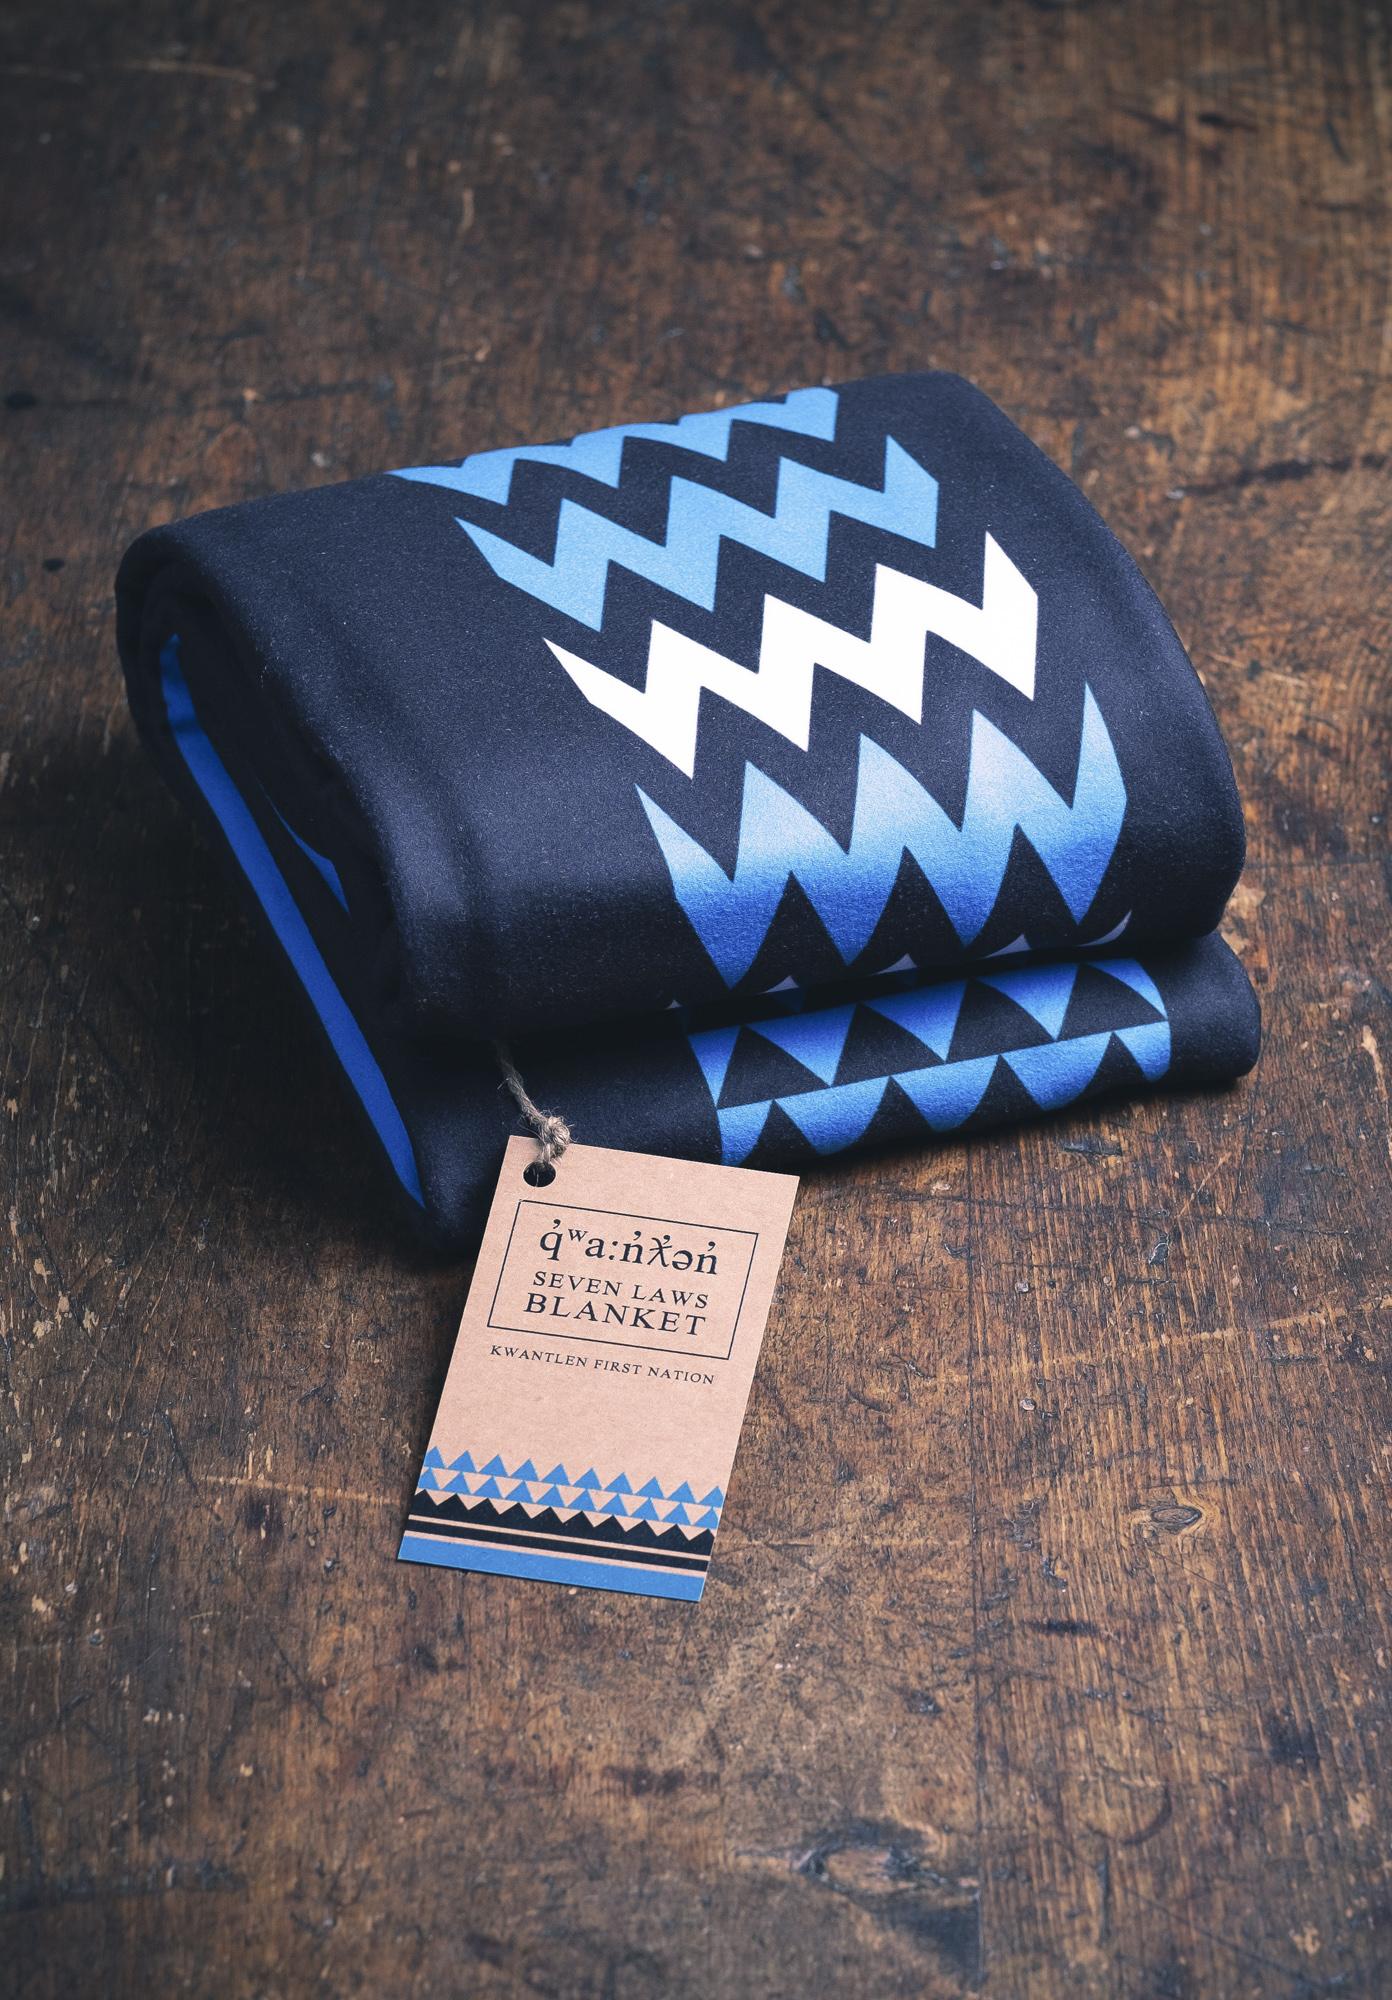 Blanket design - Kwantlen Seven Laws